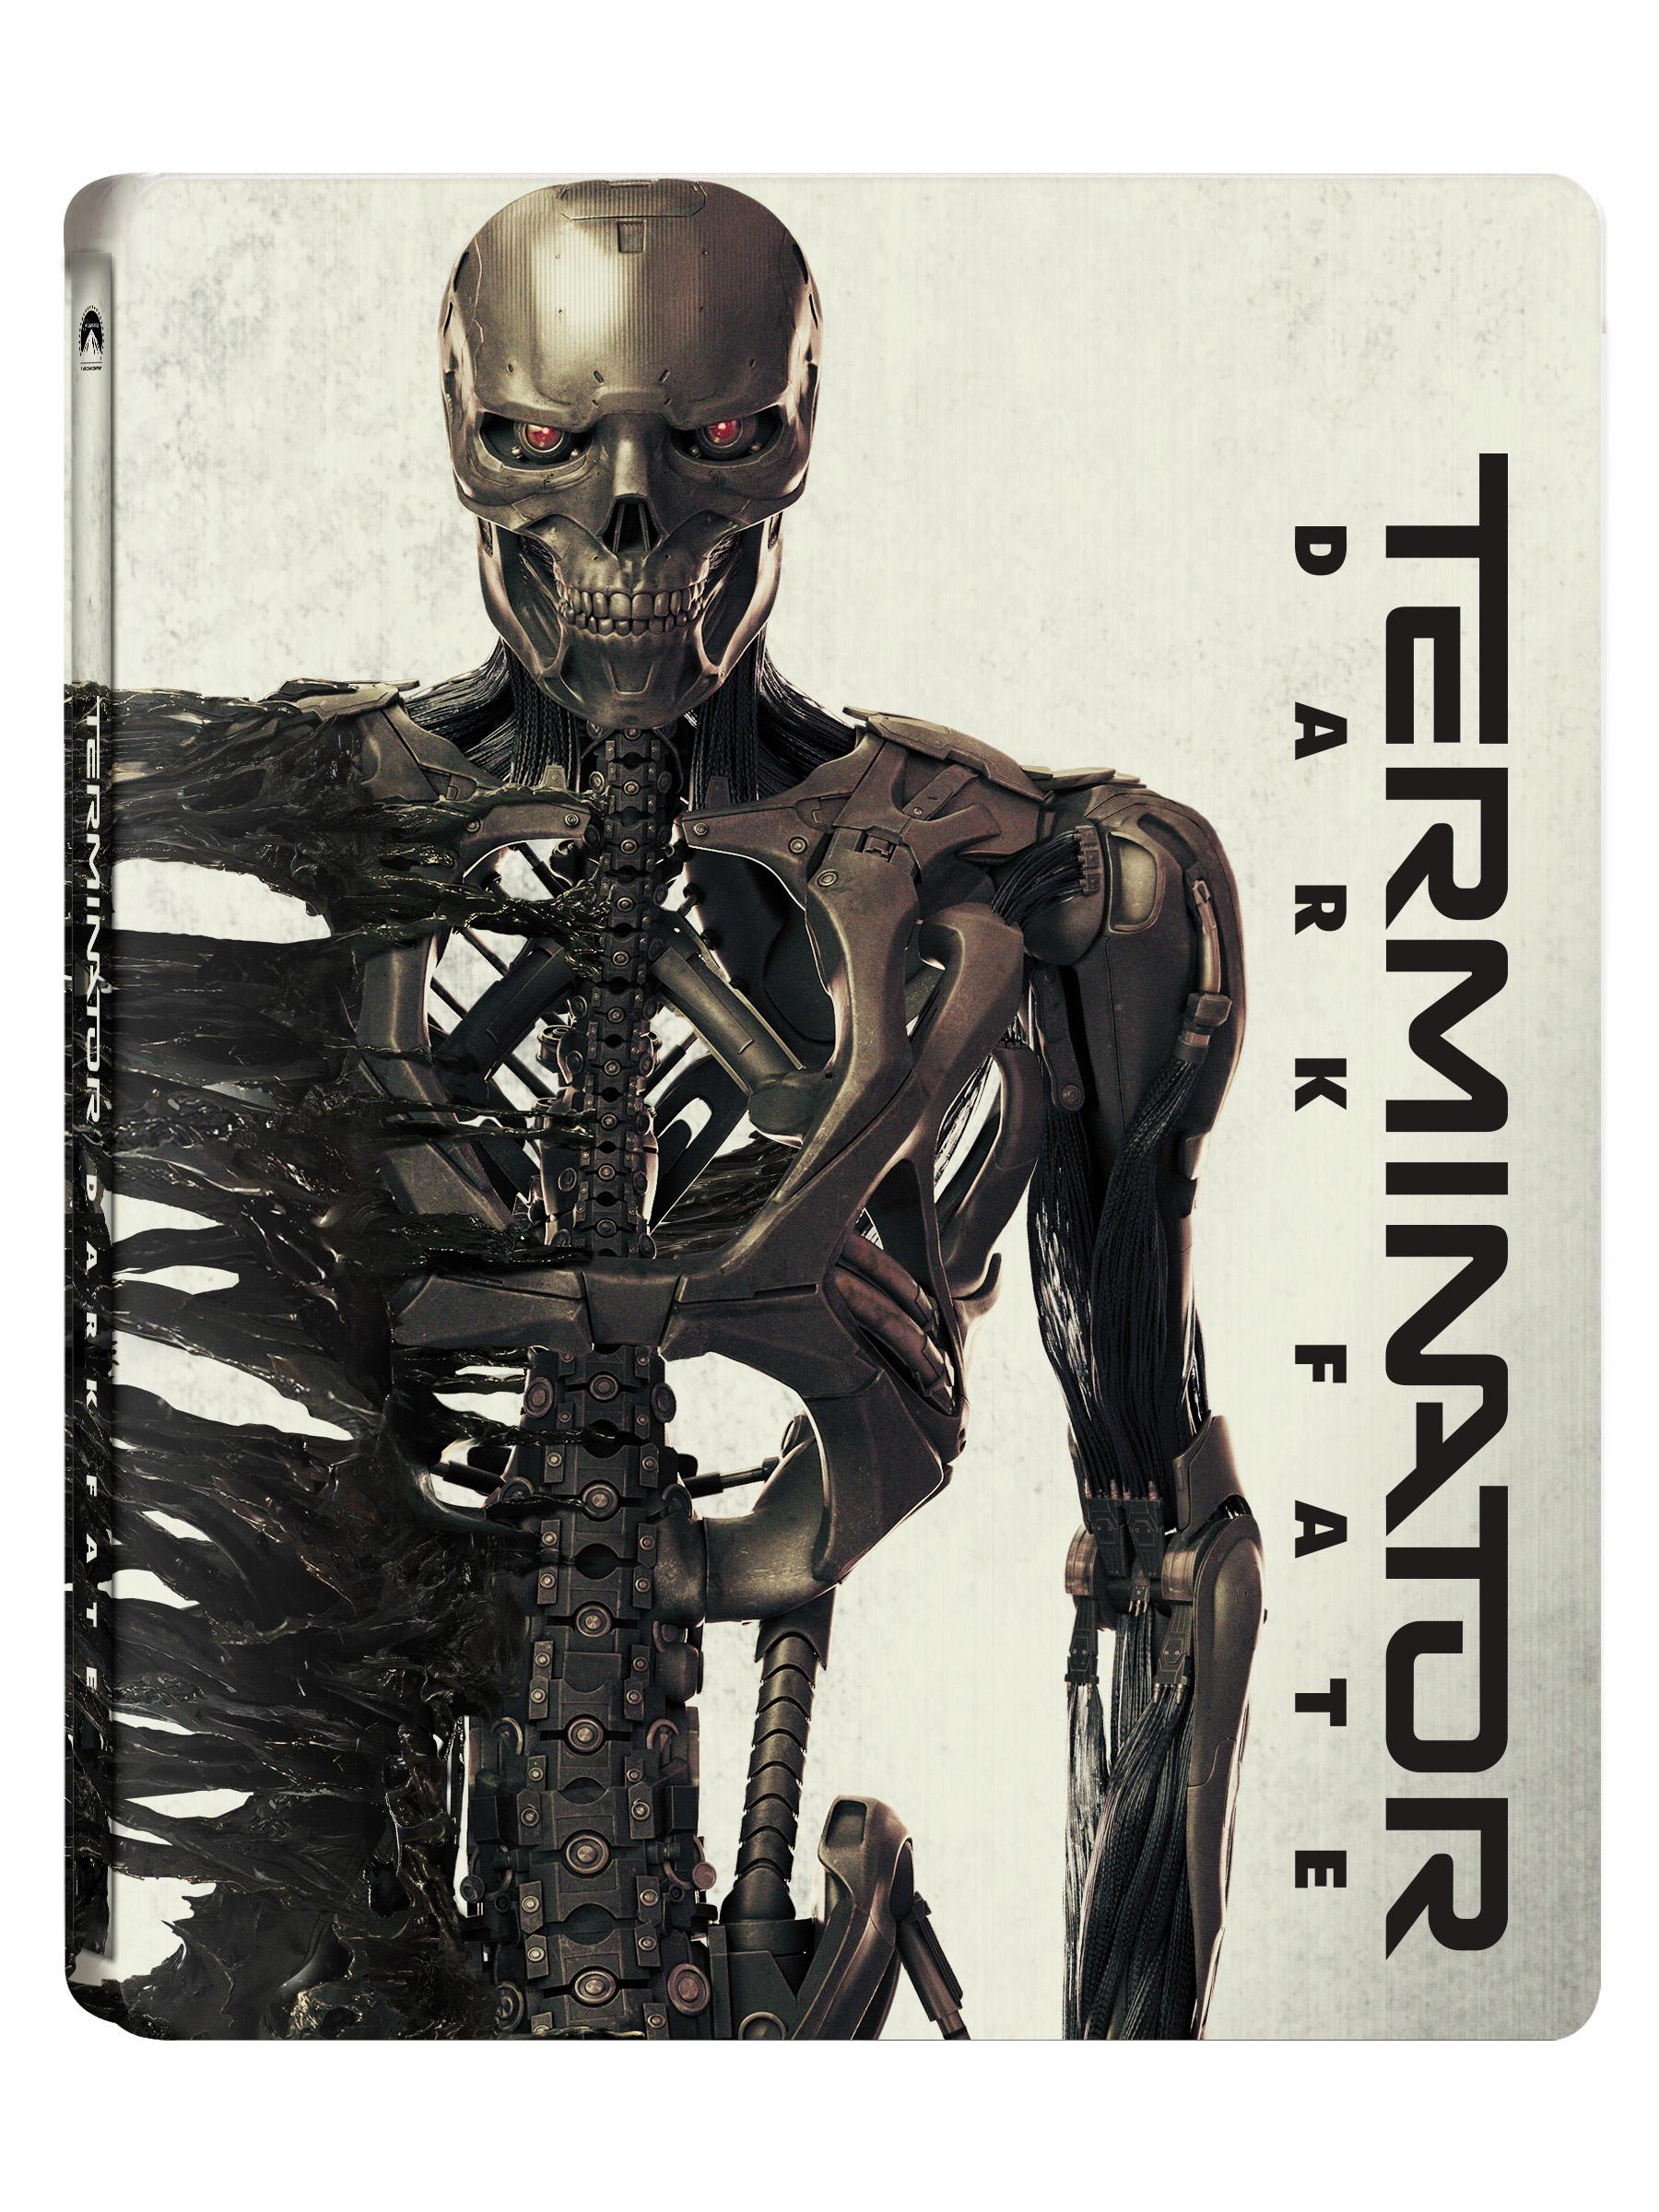 [Blu-ray] Terminator: Dark Fate 4K(2disc: 4K UHD+2D) Steelbook LE